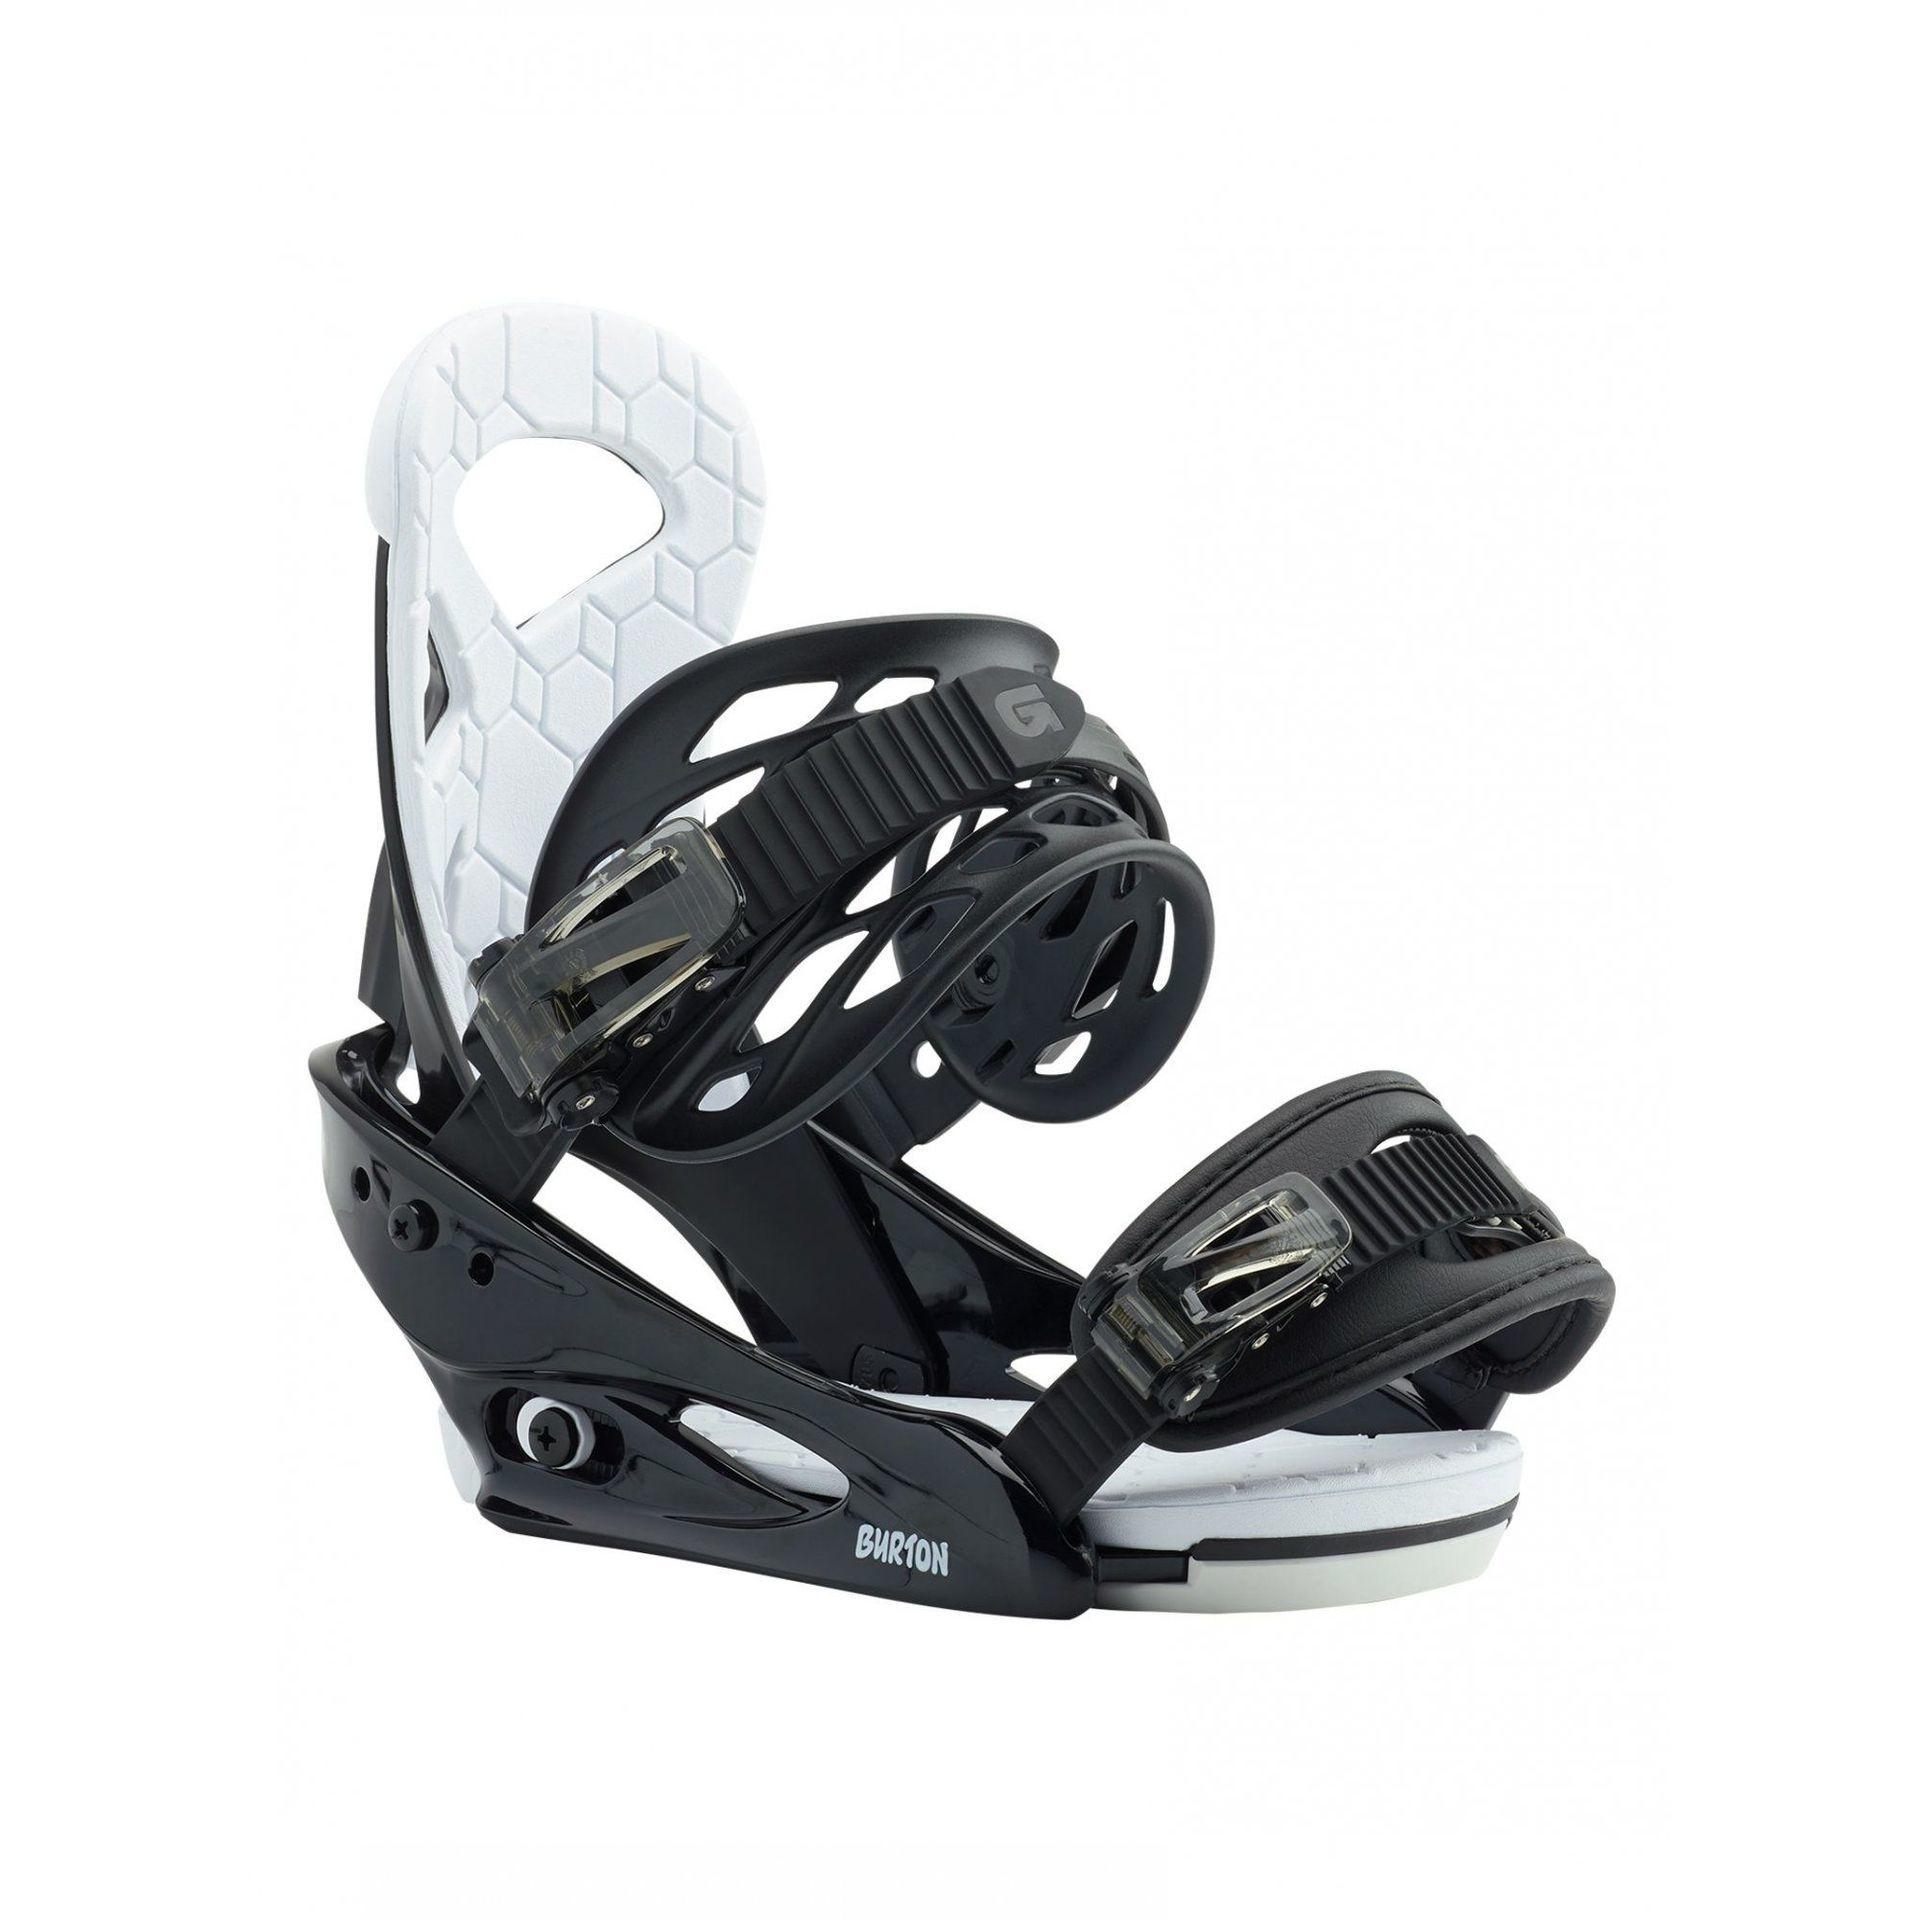 WIĄZANIA SNOWBOARDOWE BURTON SMALLS BLACK 105751-001 1